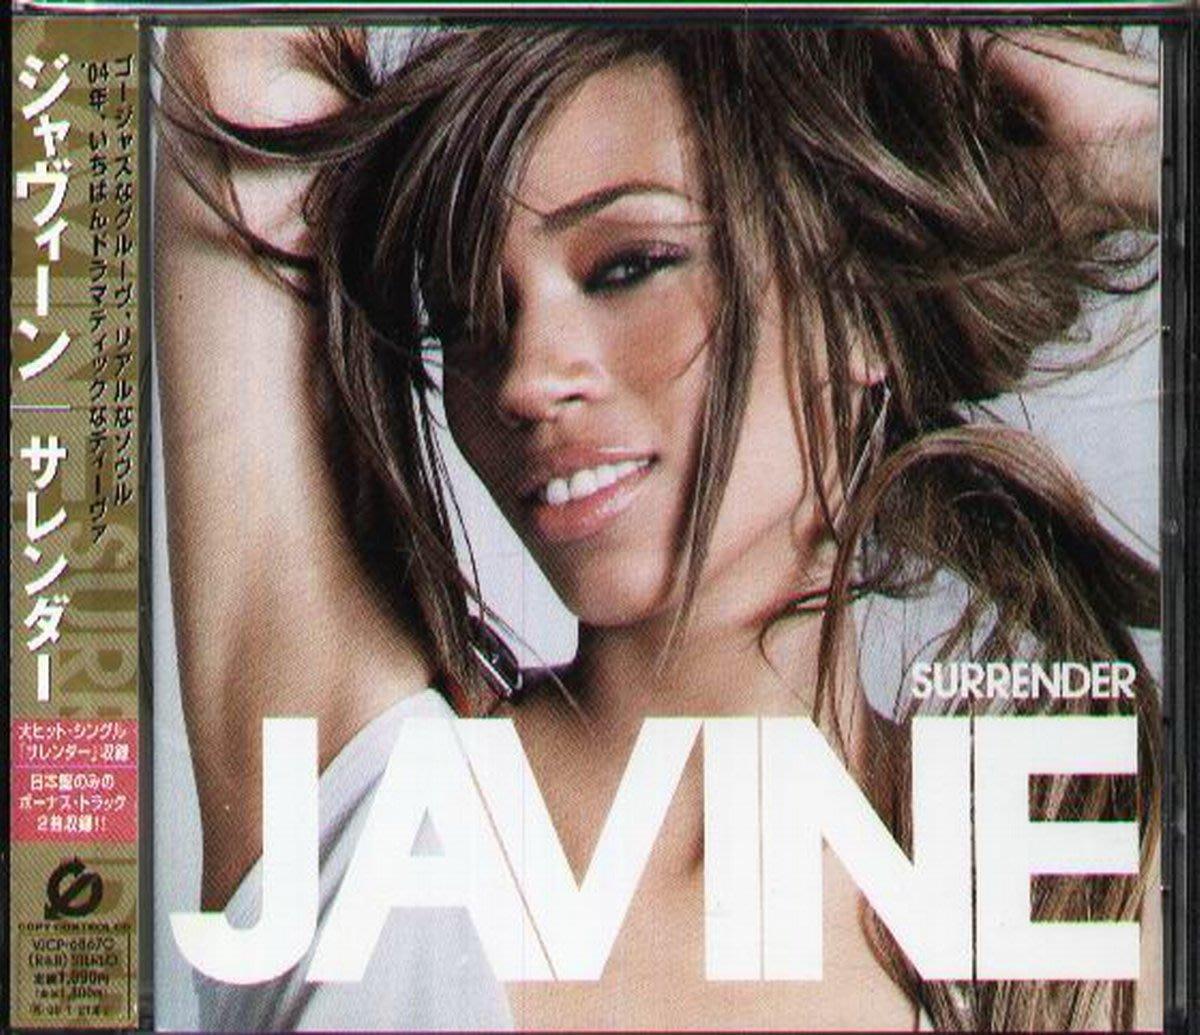 八八 - Javine - Surrender - 日版 CD+2BONUS+VIDEO OBI